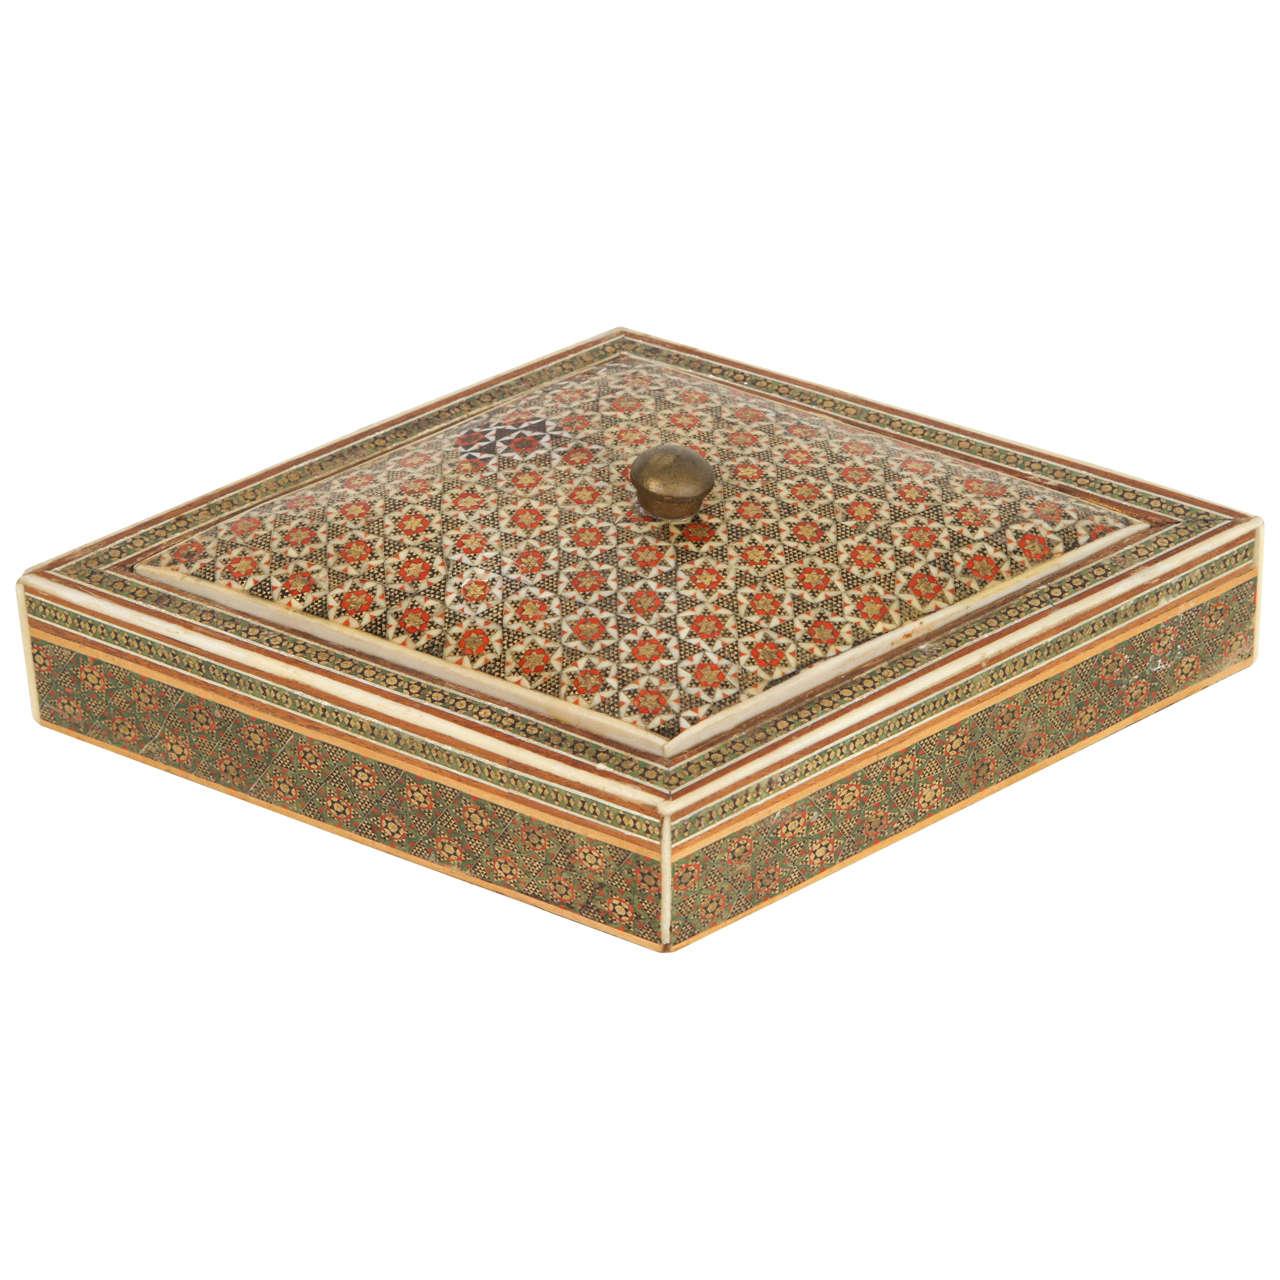 AngloIndian Micro Mosaic Inlaid Jewelry Box at 1stdibs